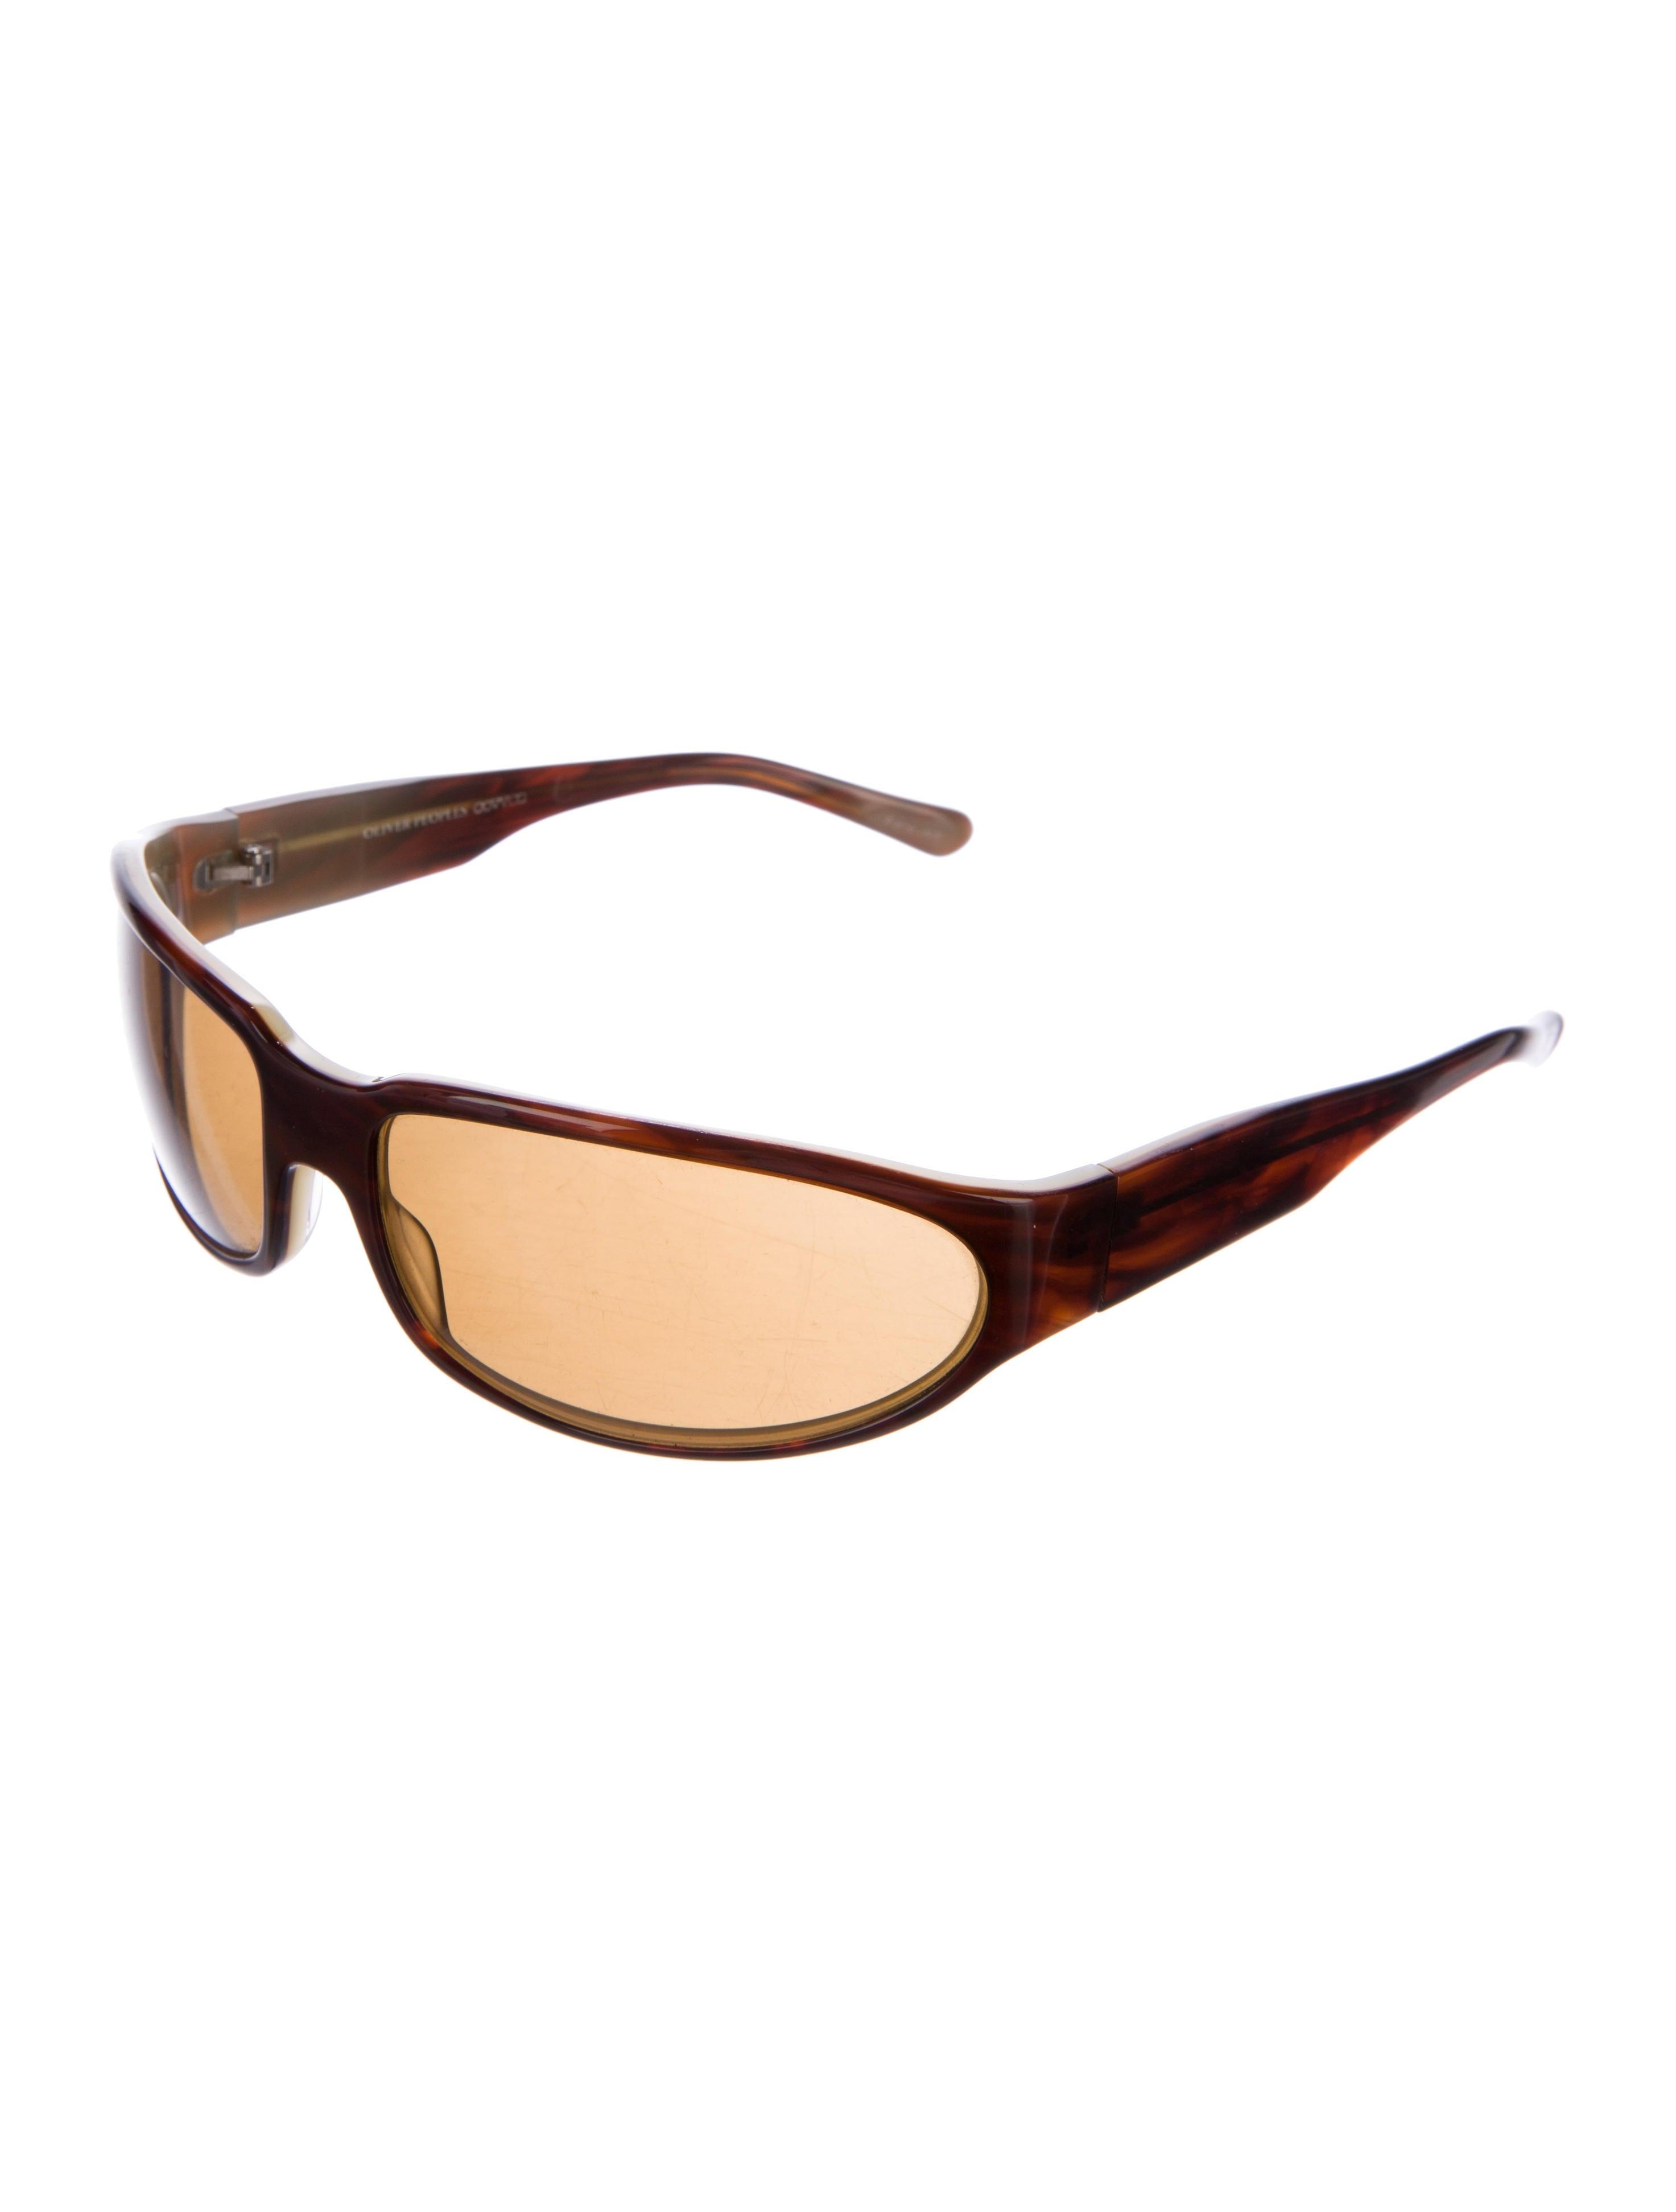 30c2c976baea Oliver Peoples Pakalas Shield Sunglasses - Accessories - WOP23272 ...